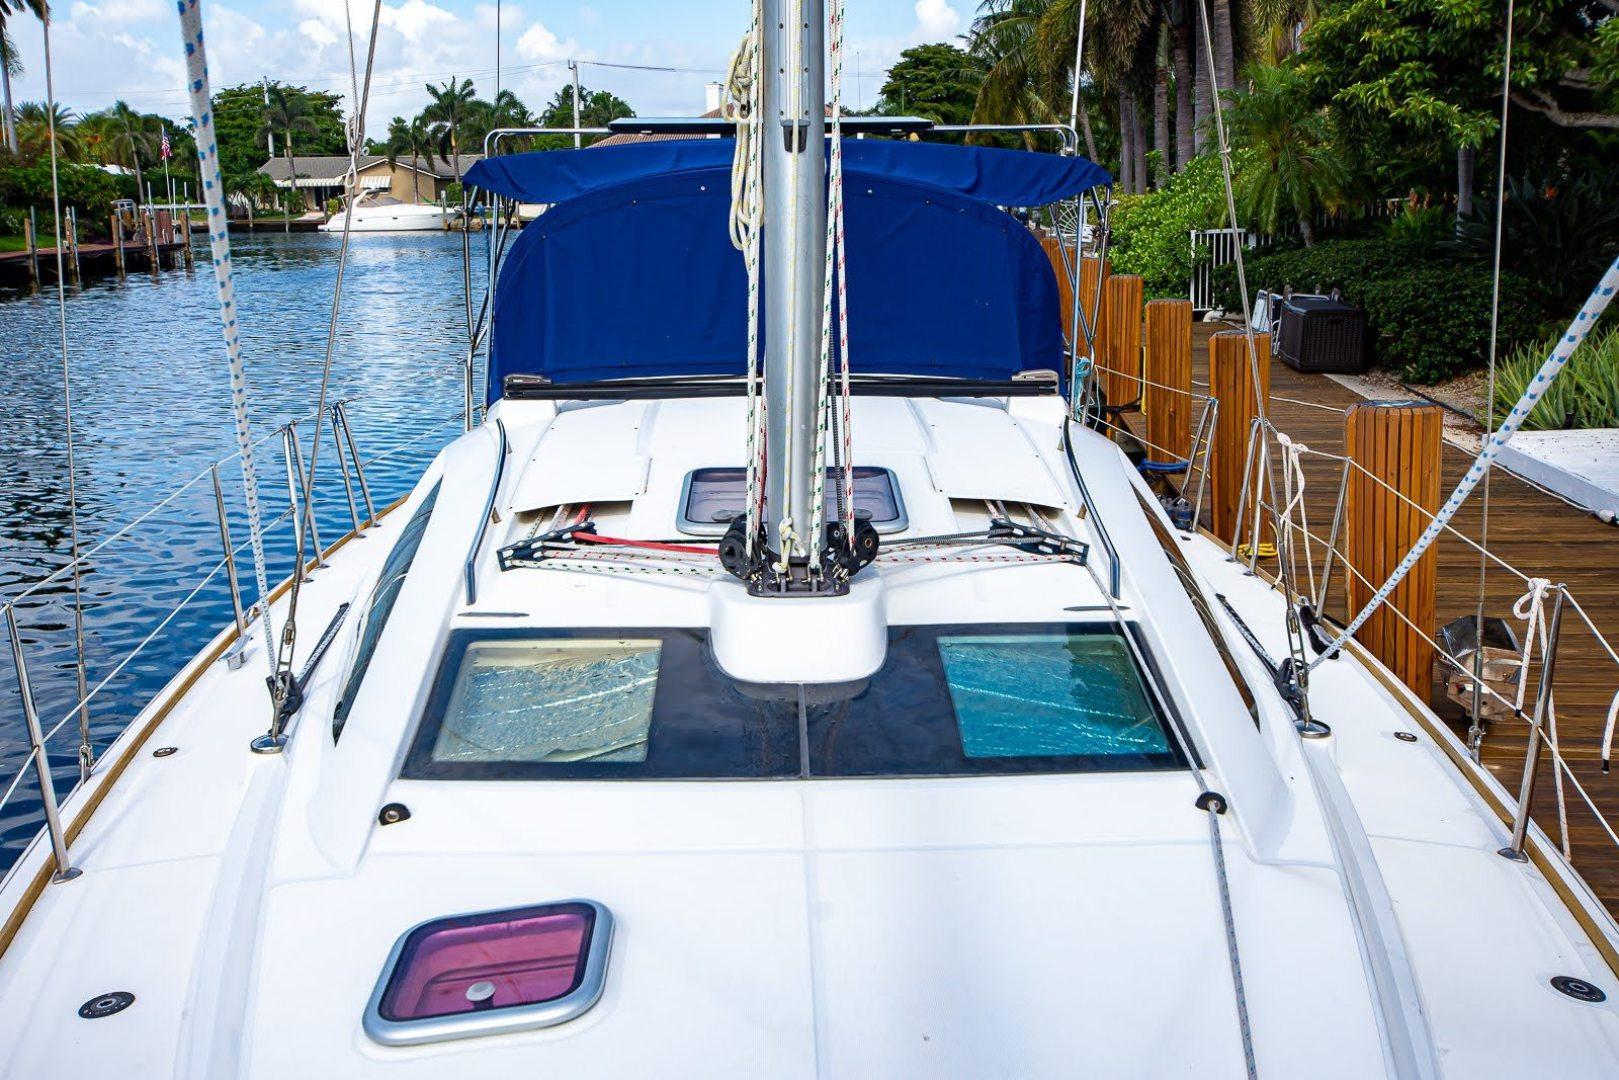 Jeanneau-42DS 2007-Layla Fort Lauderdale-Florida-United States-Jeanneau 42DS-1551269 | Thumbnail